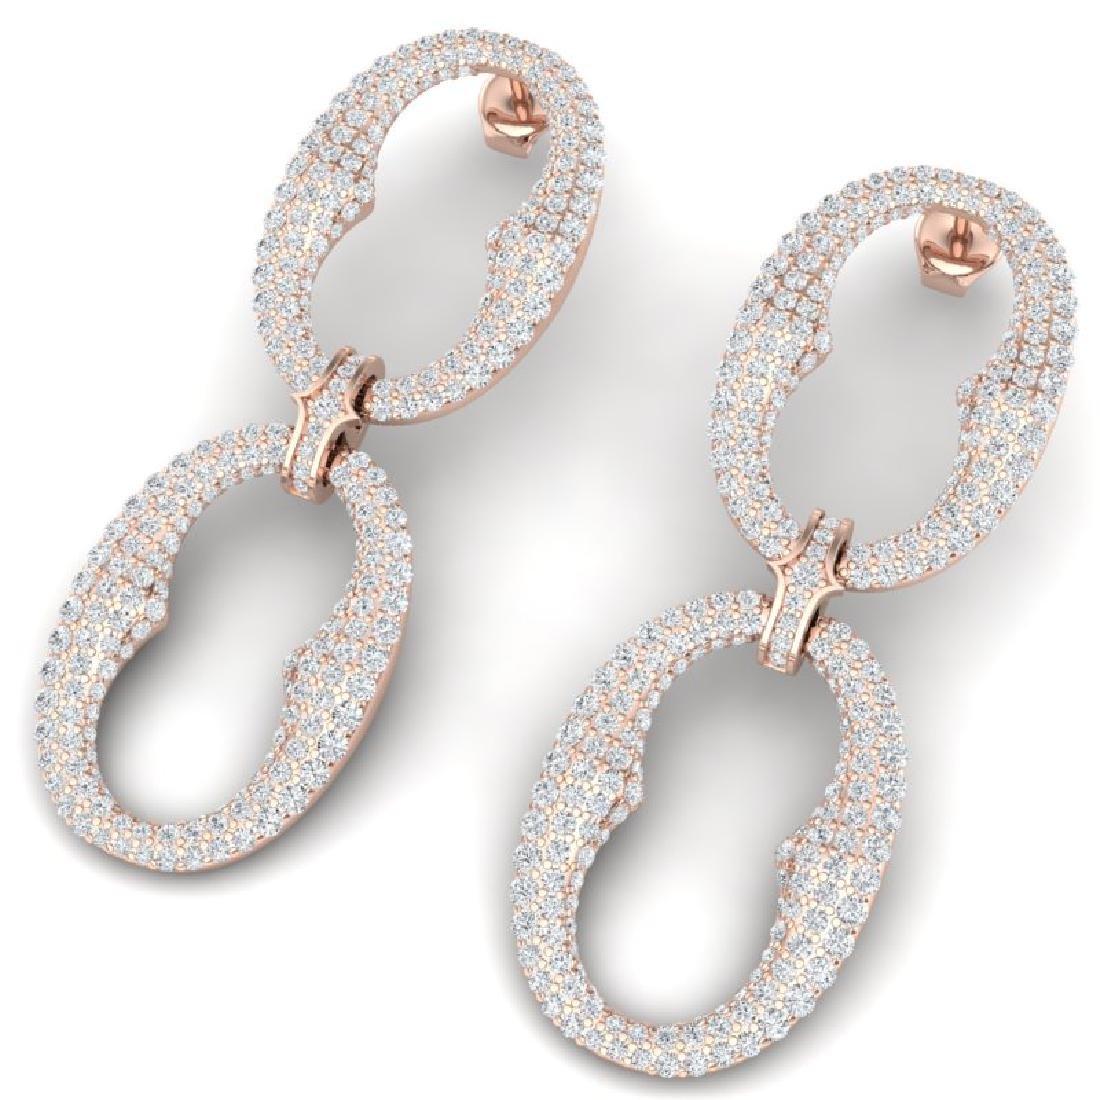 7 CTW Certified VS/SI Diamond Earrings 18K Rose Gold